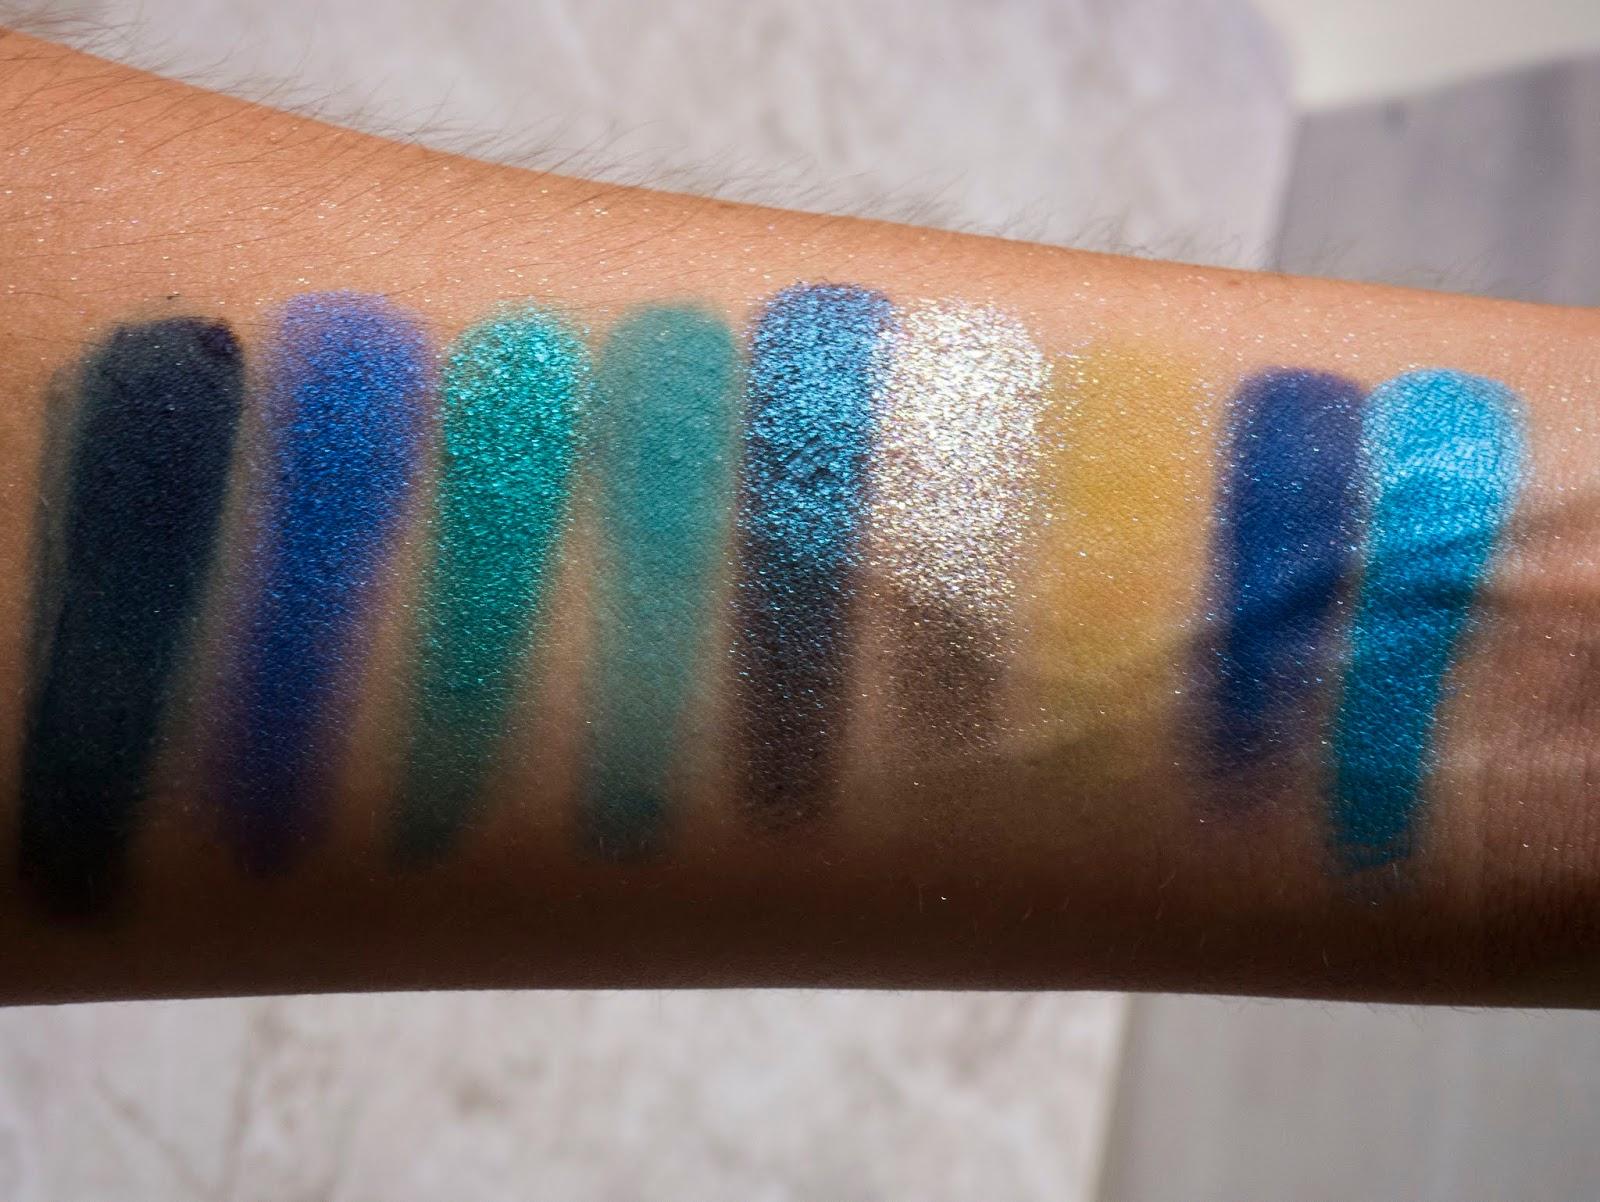 Huda beauty - Obsessions Sapphire